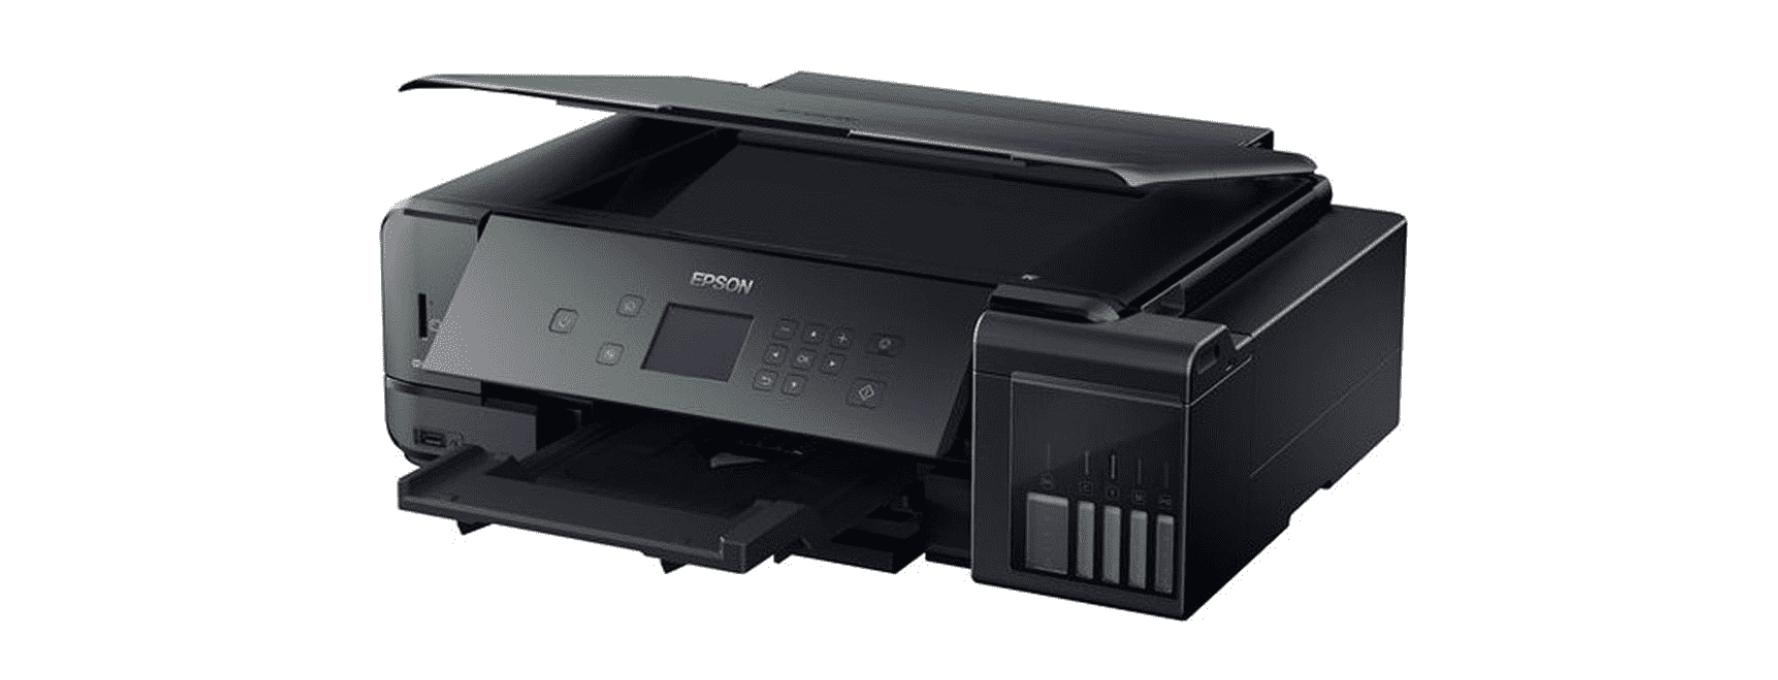 drukarka fotograficzna Epson EcoTank ET-7750